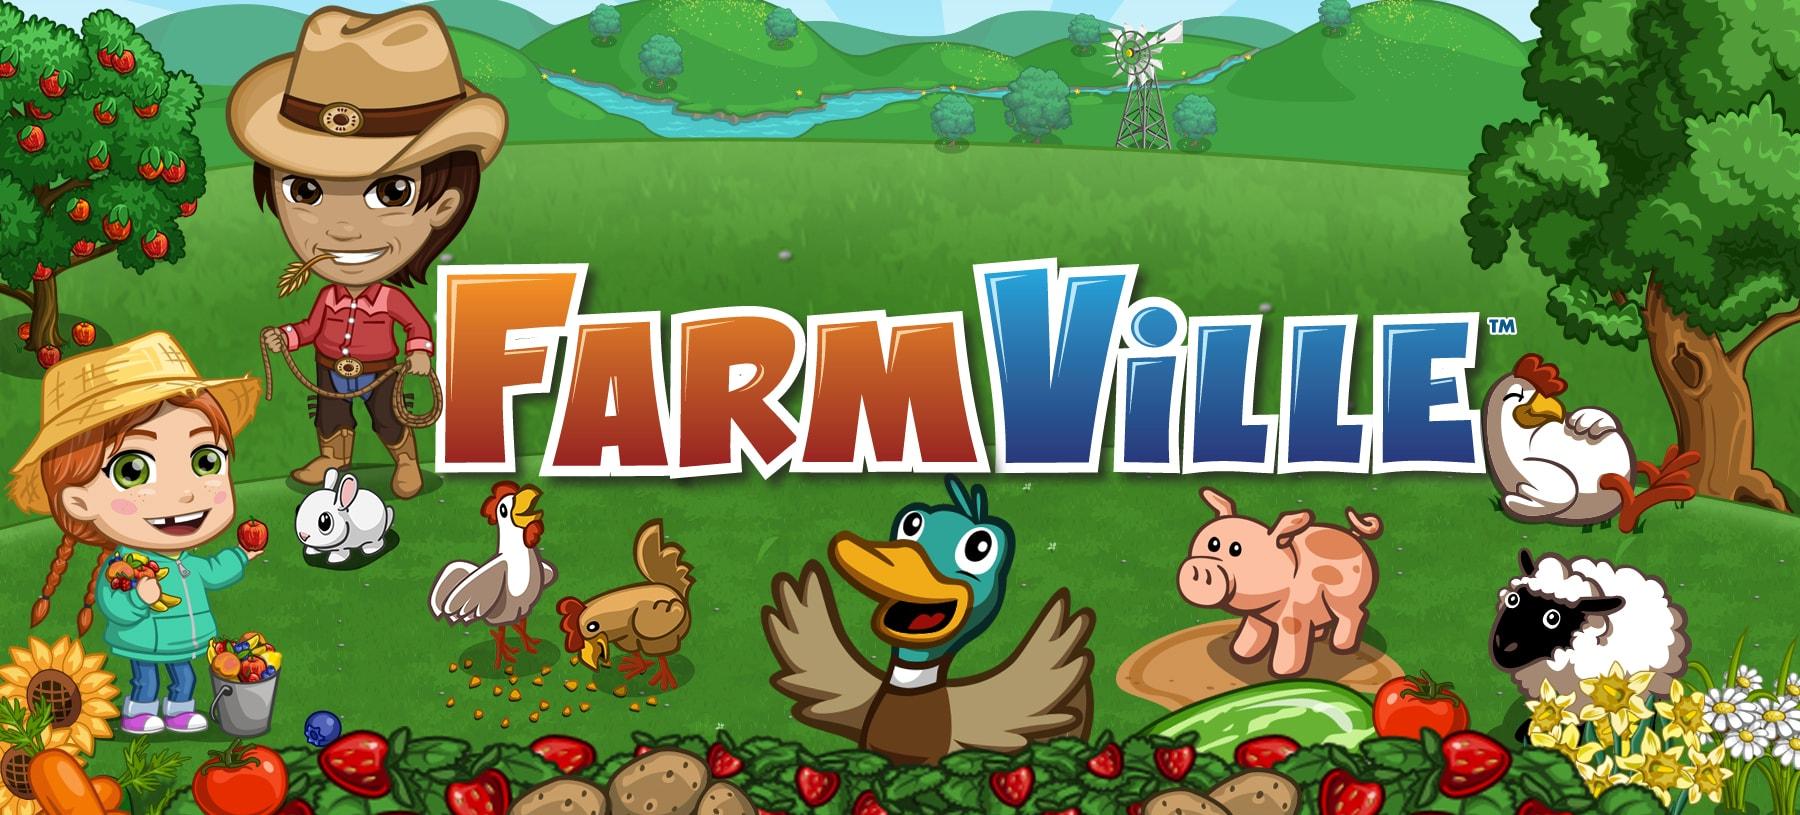 Farmville Game on Facebook to shut down on 31st December